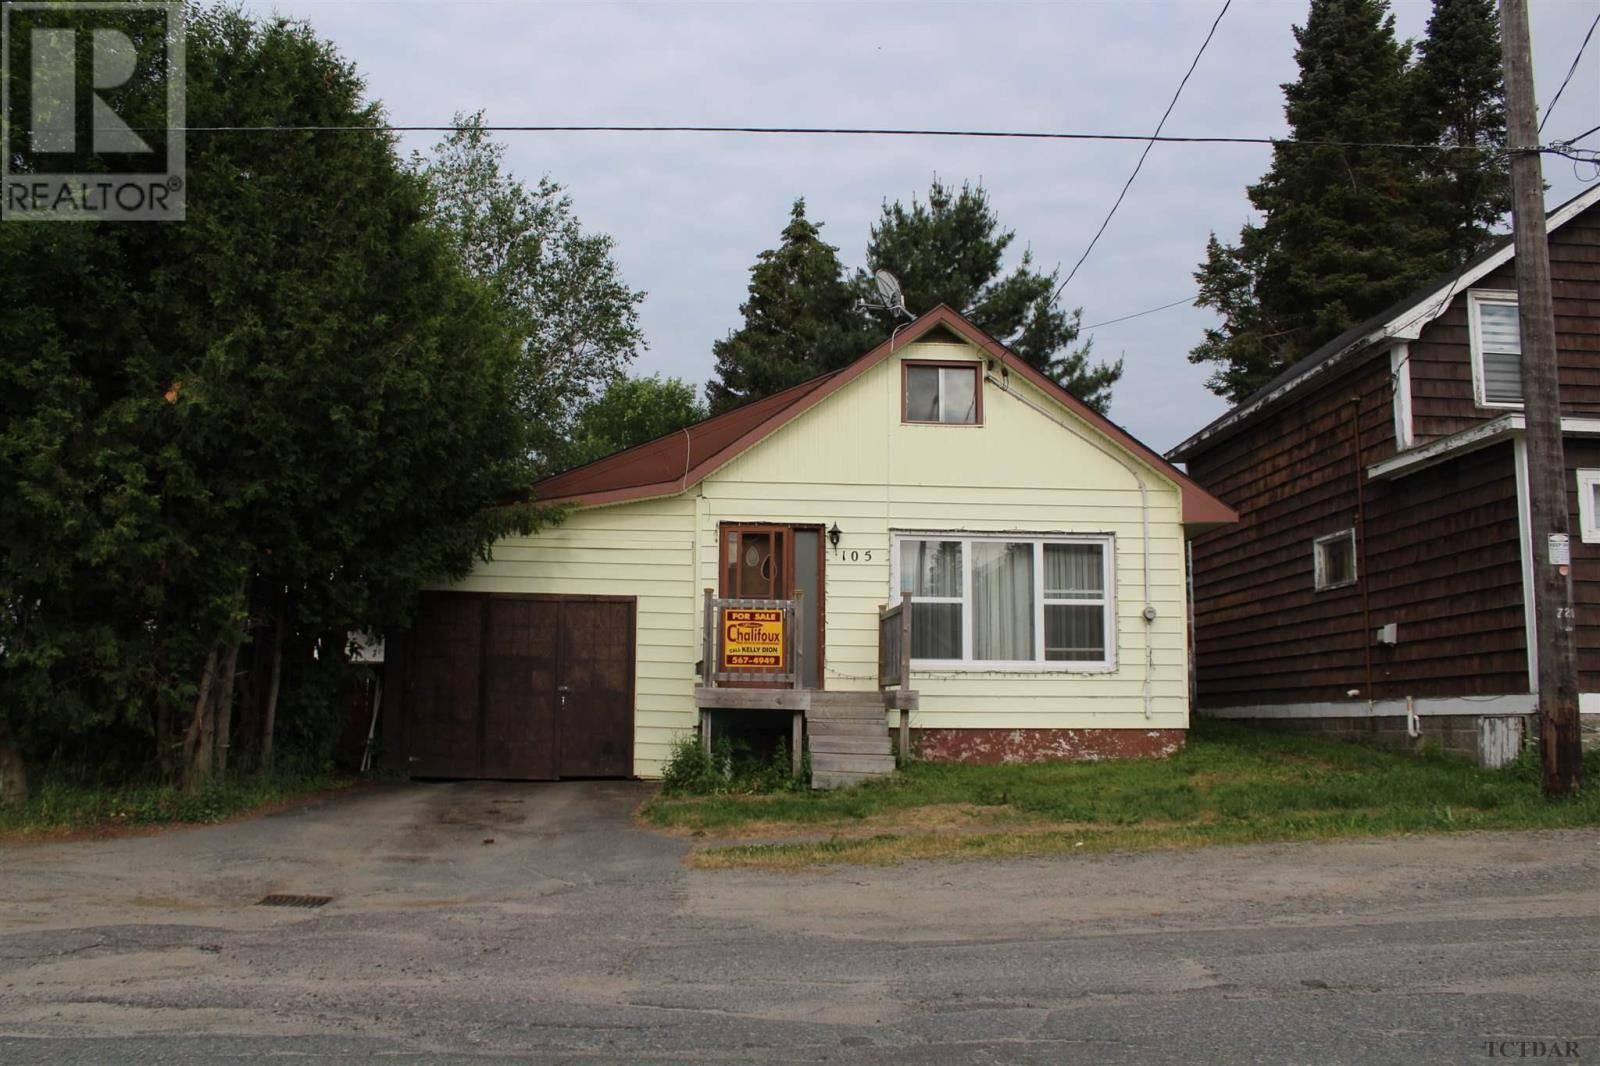 House for sale at 105 Pollock St Kirkland Lake Ontario - MLS: TM191598